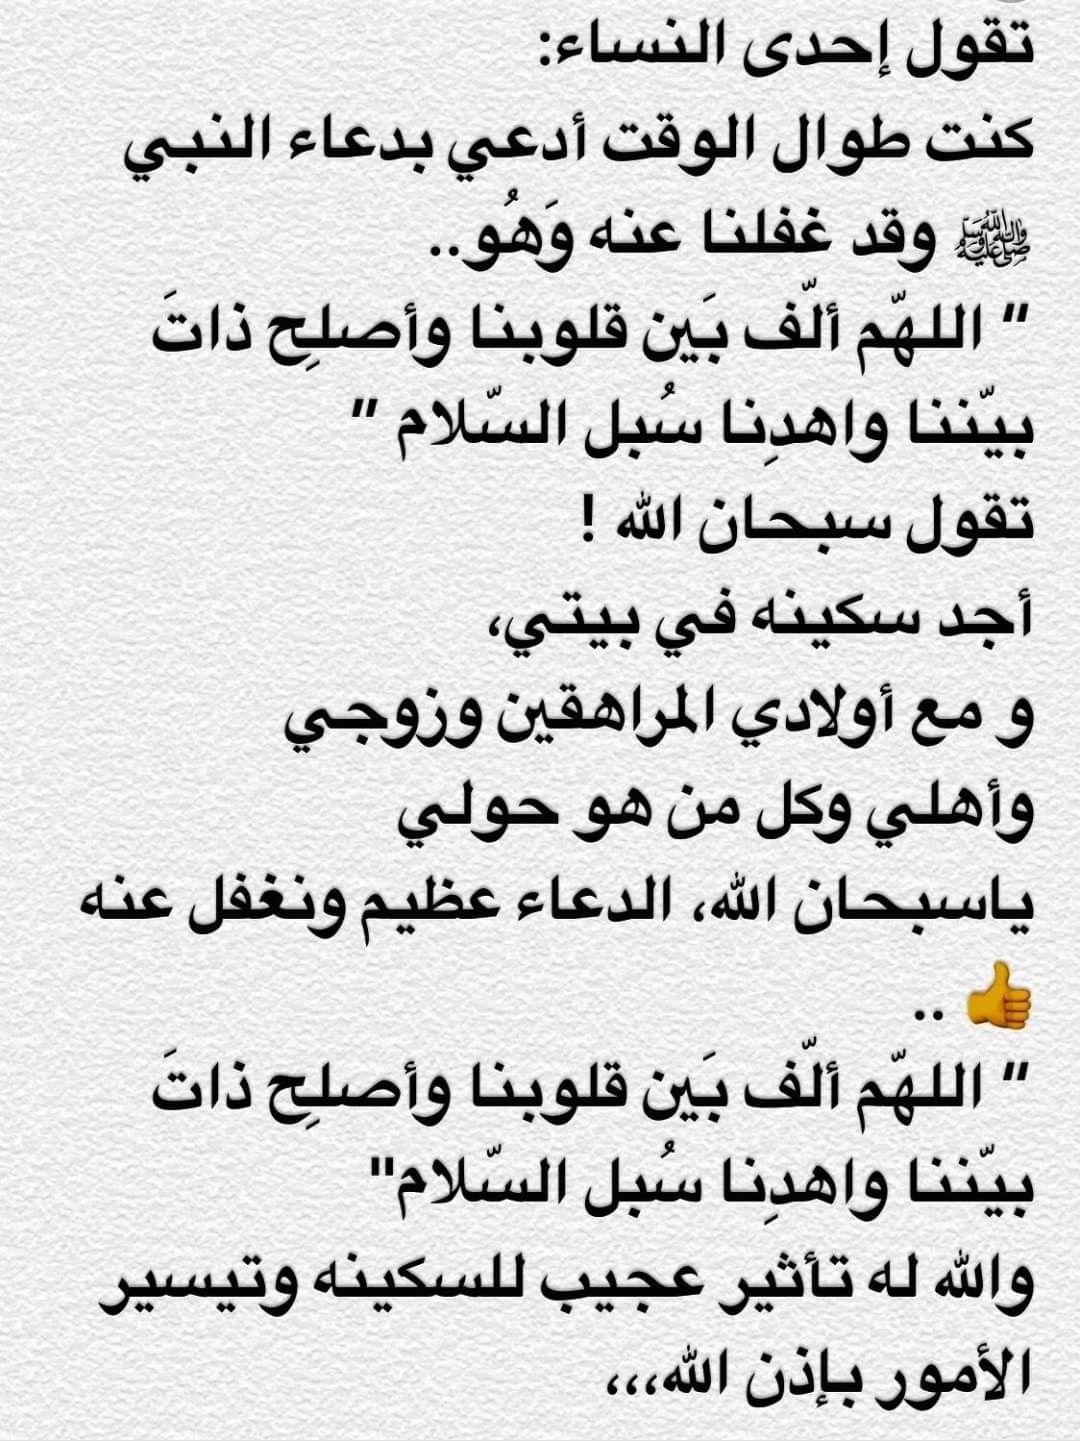 Pin By Naminas On مناجاة وادعية اسلاميات Islamic Love Quotes Quran Quotes Love Islamic Phrases